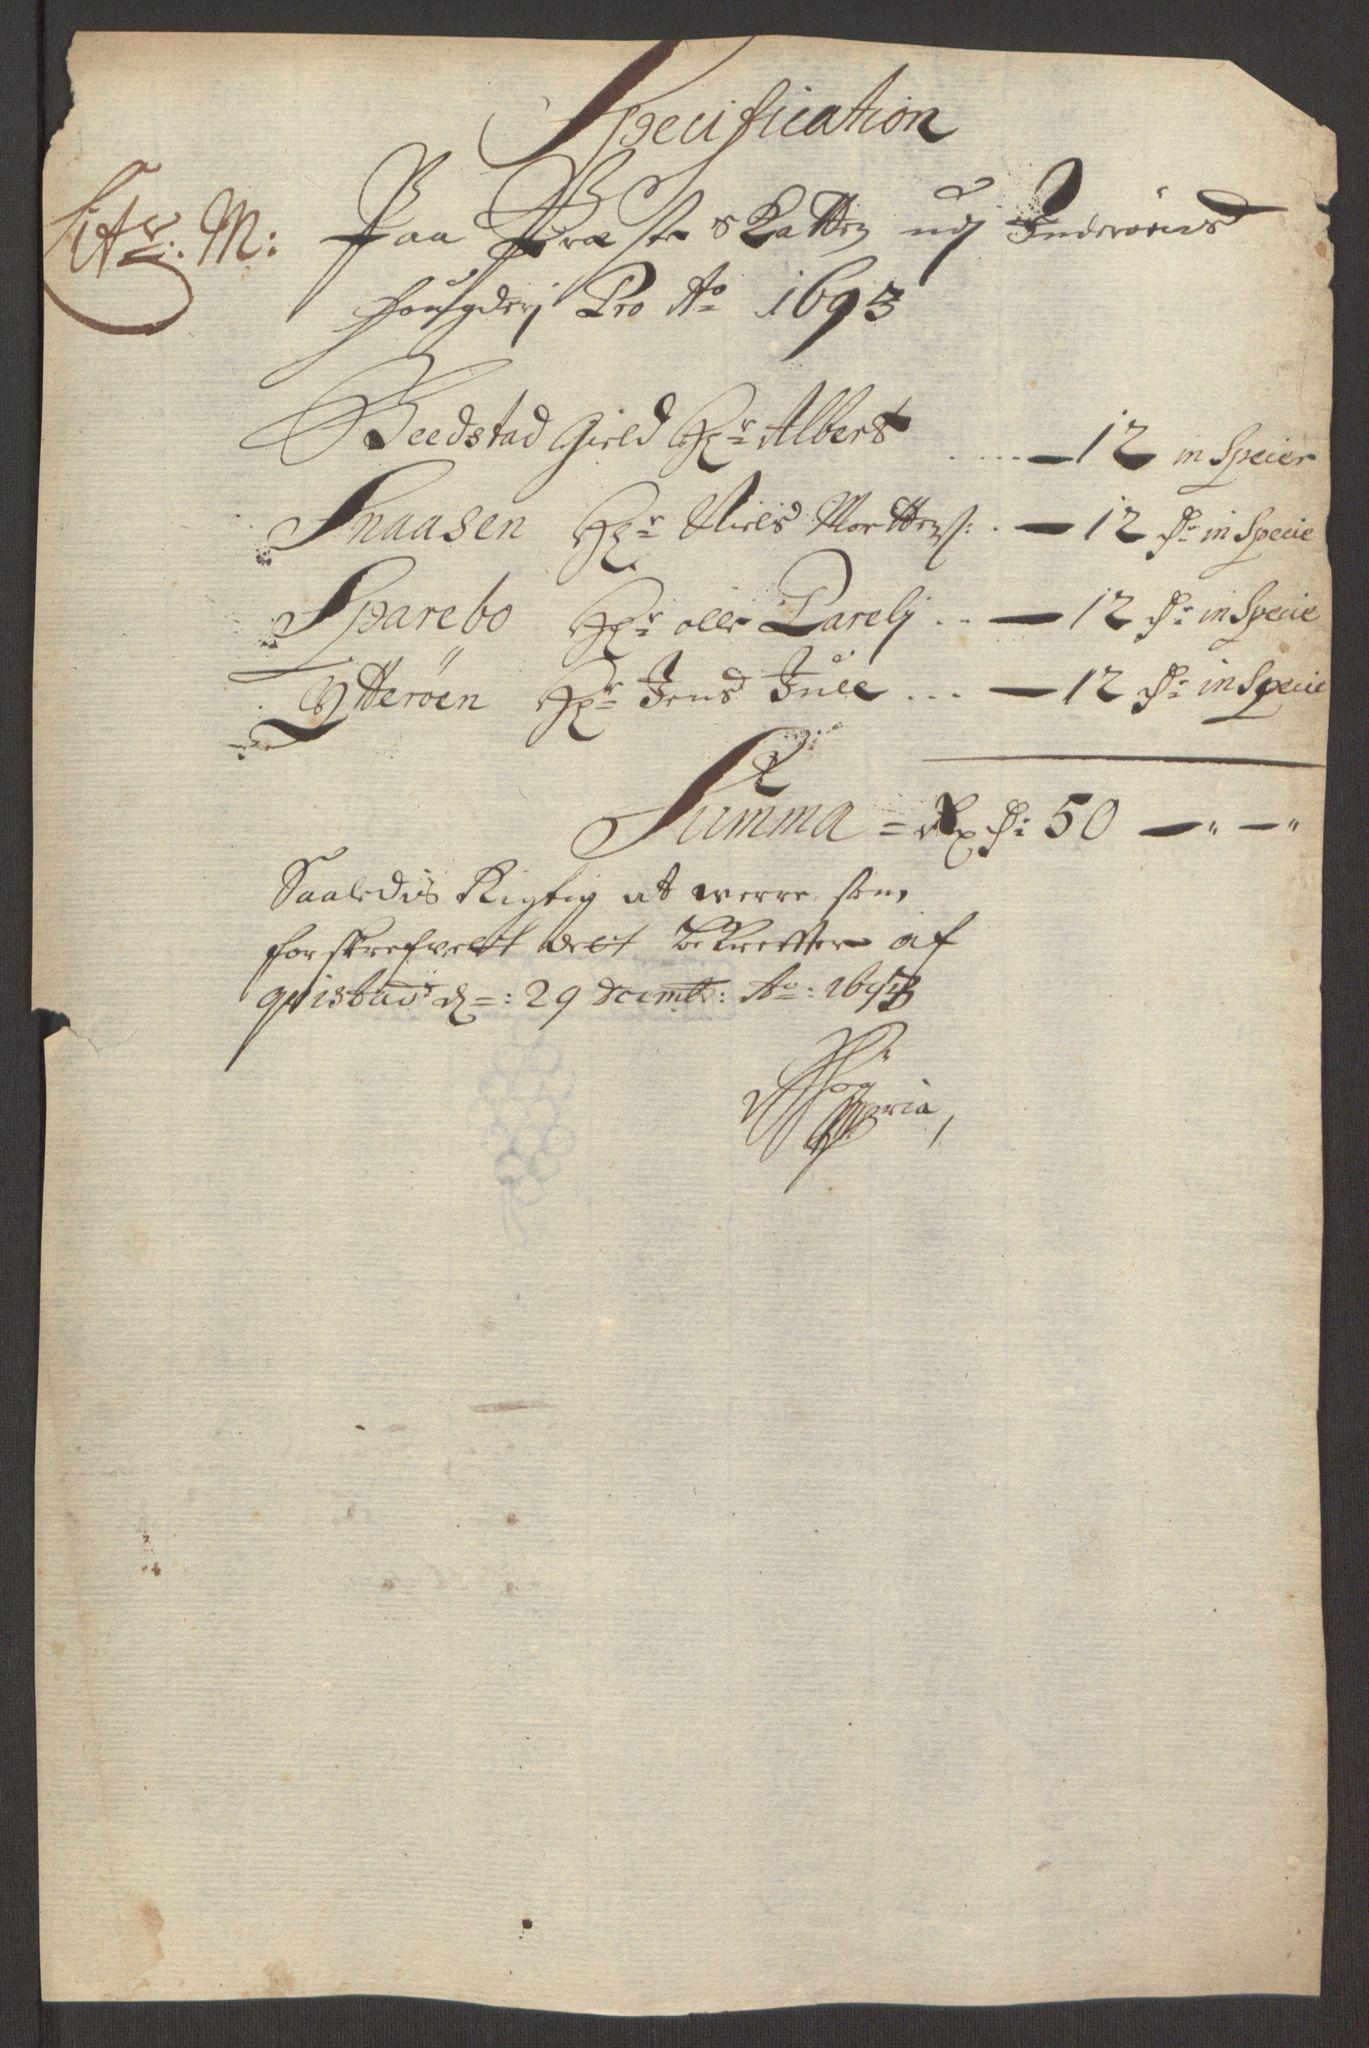 RA, Rentekammeret inntil 1814, Reviderte regnskaper, Fogderegnskap, R63/L4308: Fogderegnskap Inderøy, 1692-1694, s. 509